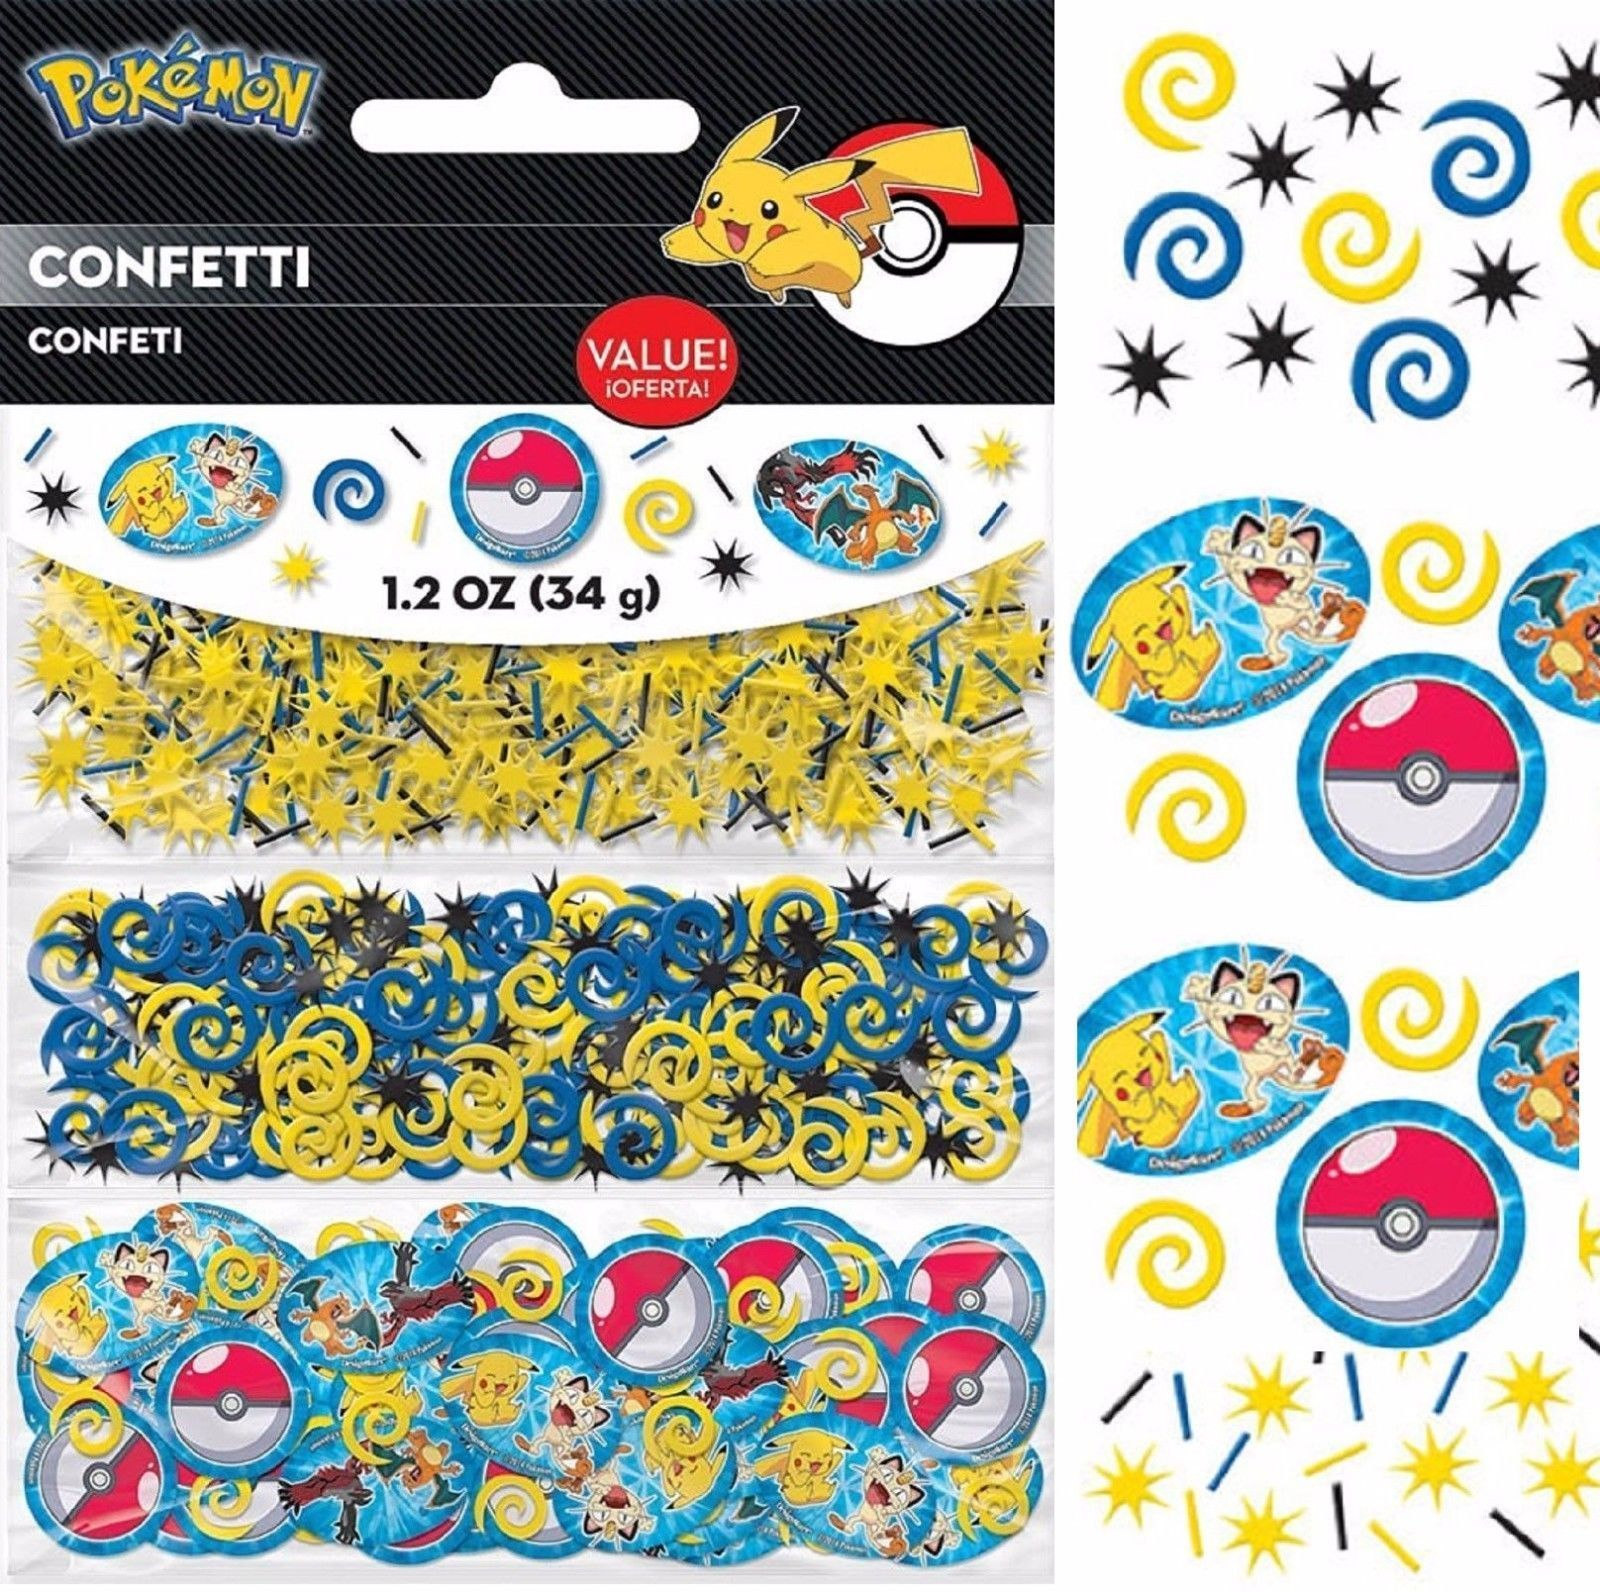 Celebrations & Occasions Pikachu Pokemon Go Confetti Pikachu Birthday Decoration Party Supply